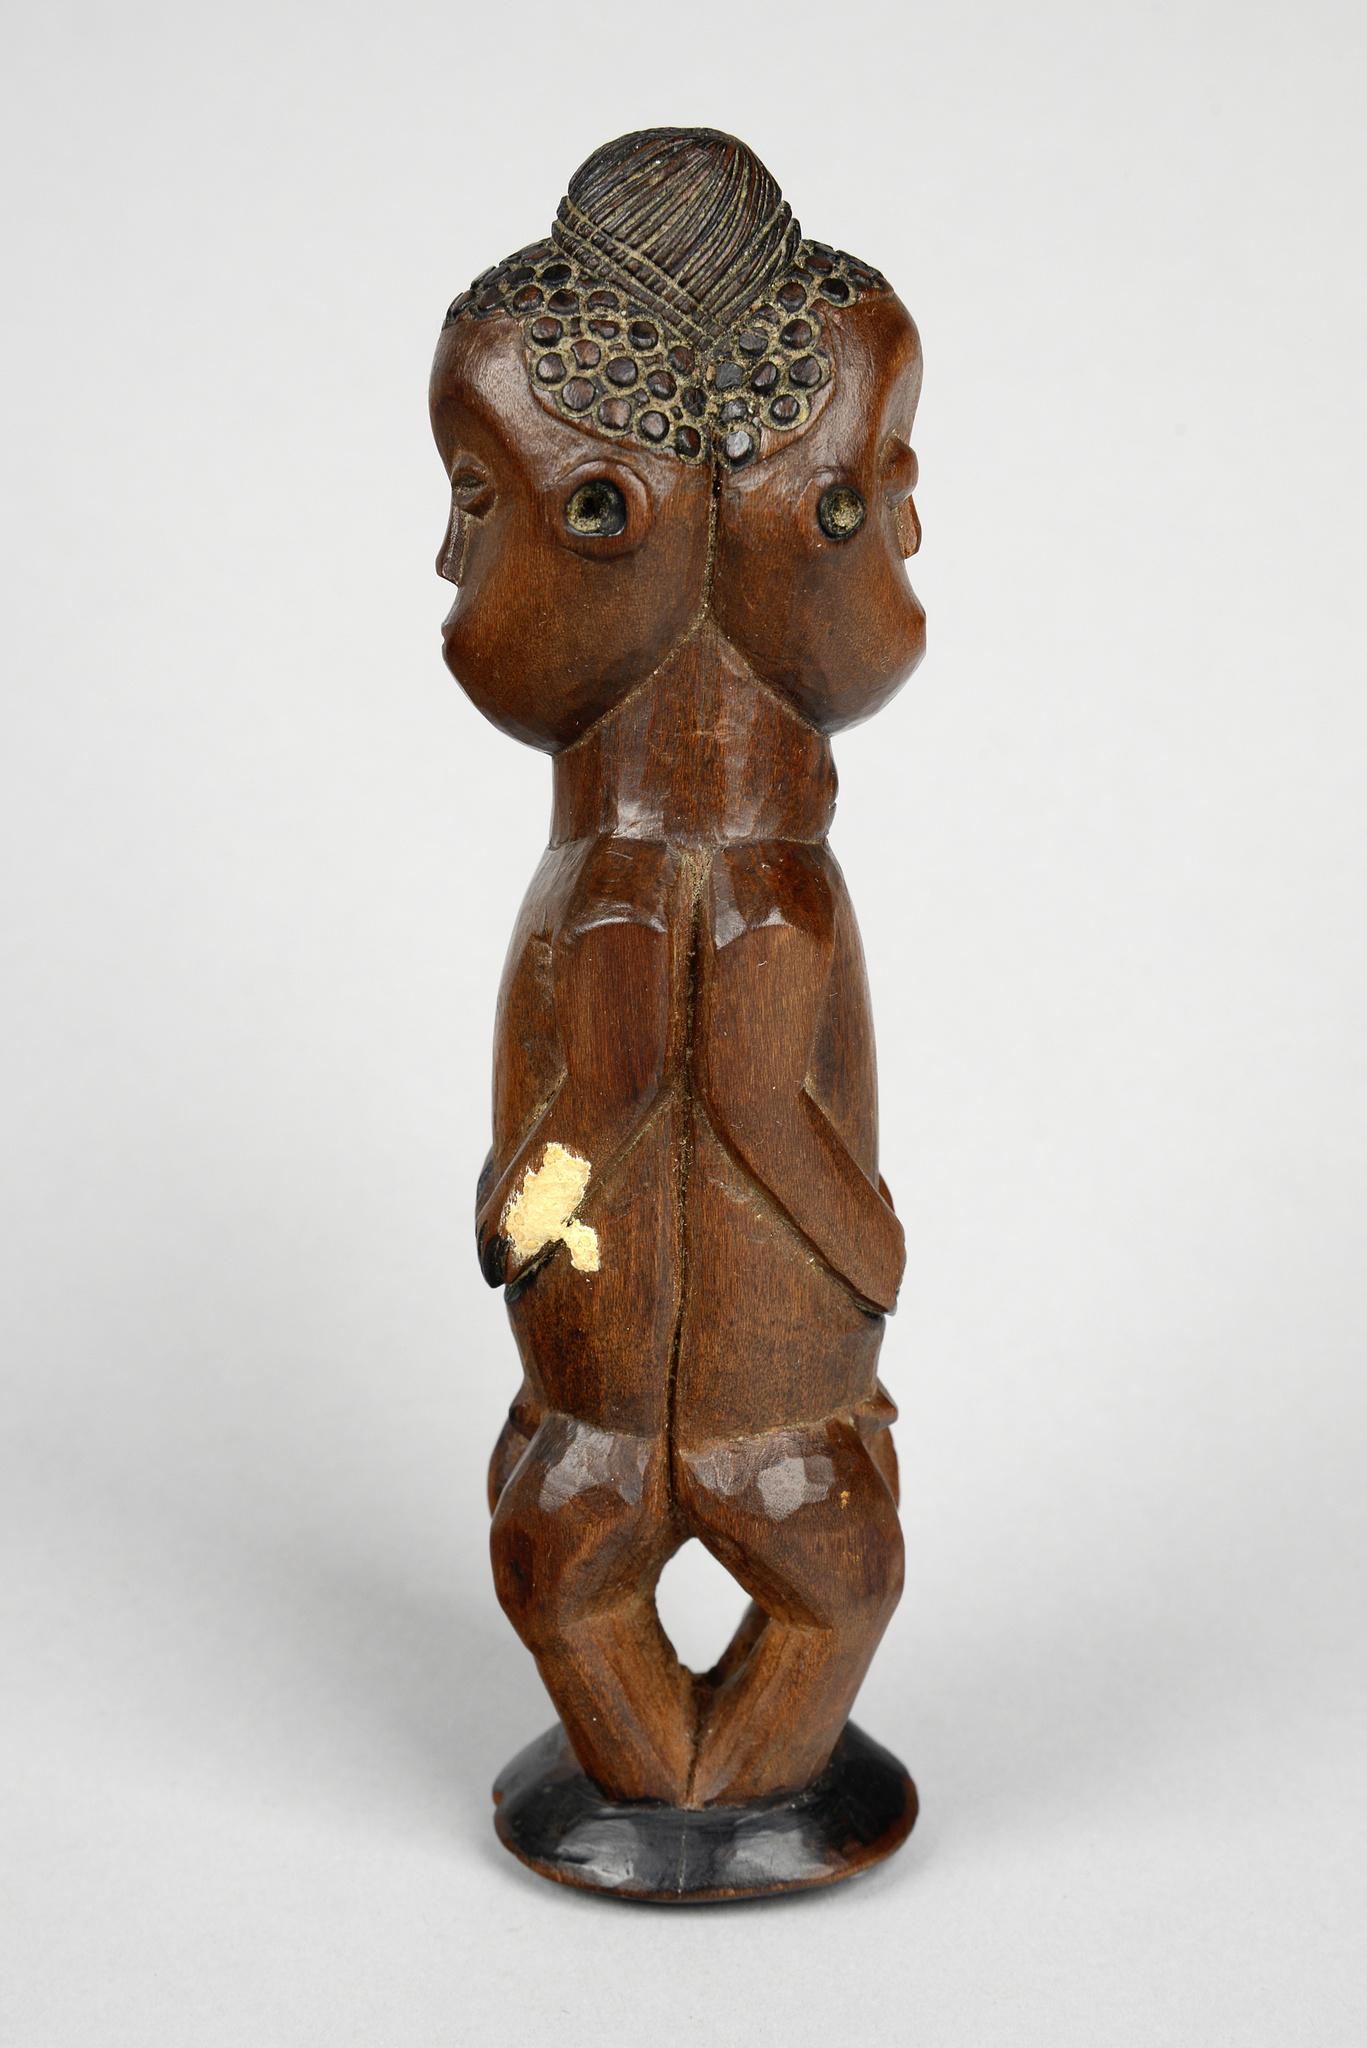 Janus figure with prominent coiffure